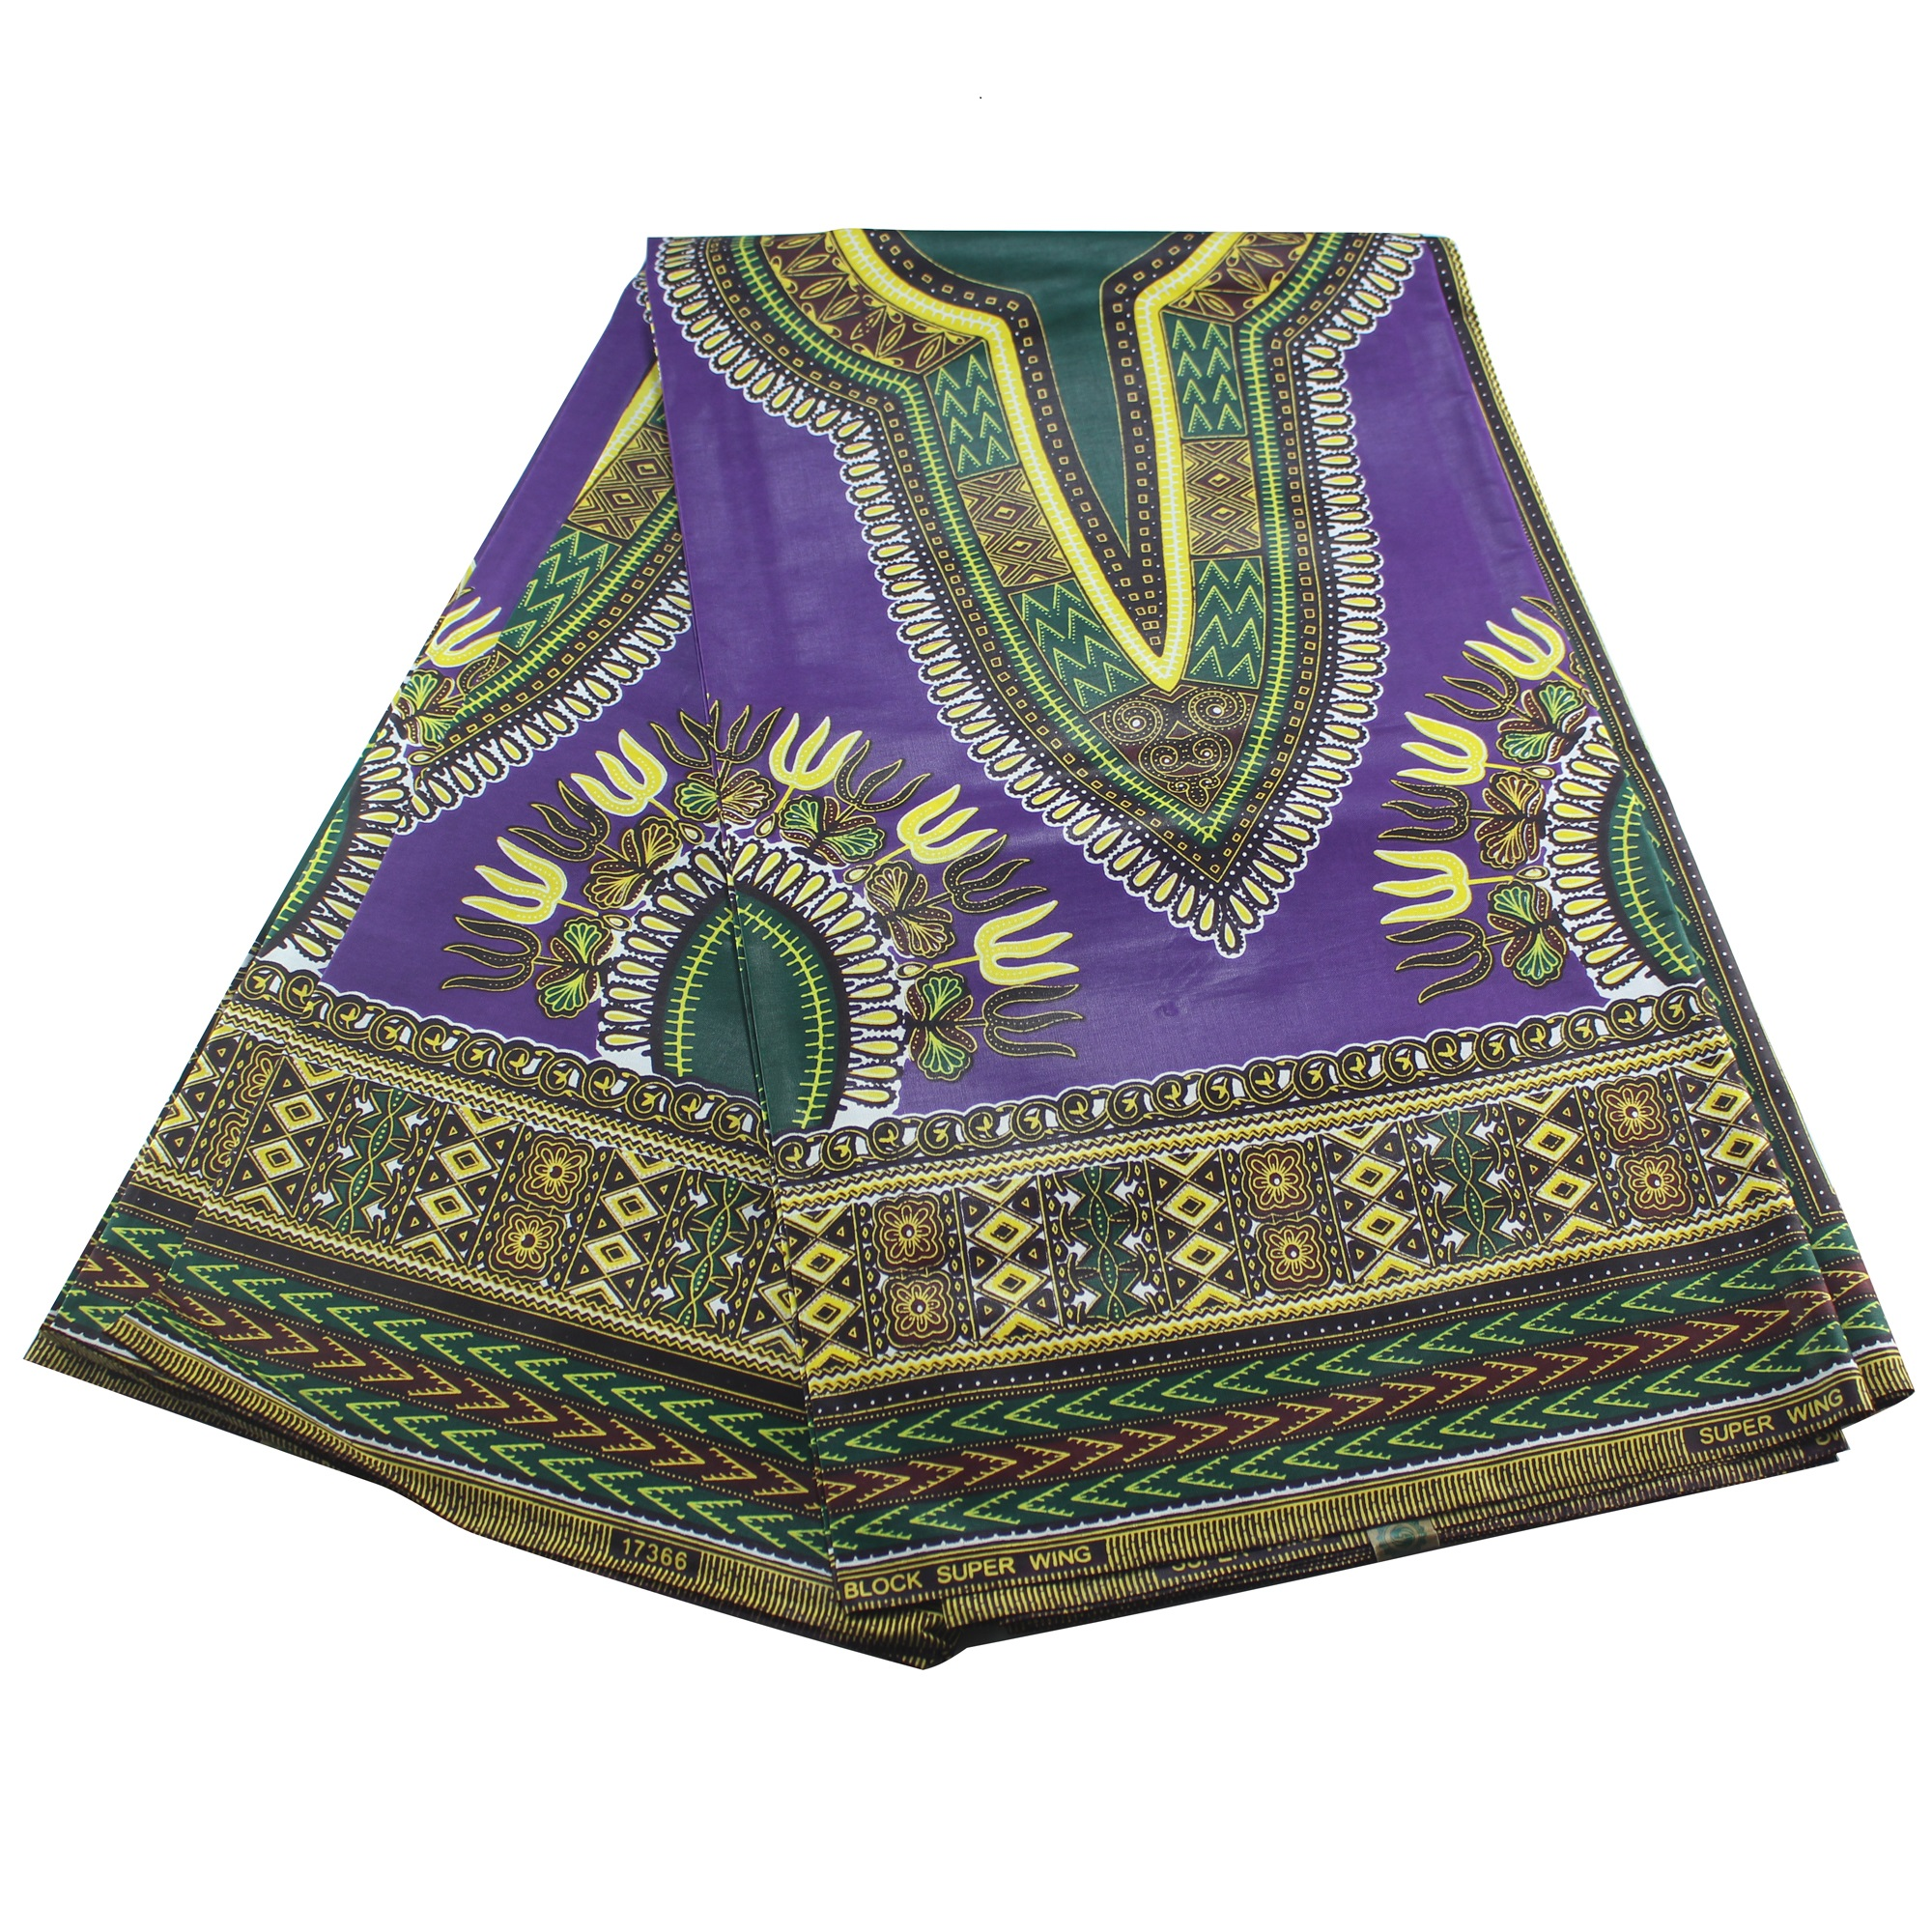 2019 Popular Dashiki Vintage Wax Cloth African Dashiki Wax Prints Fabric 6yards/lot For Party Dress